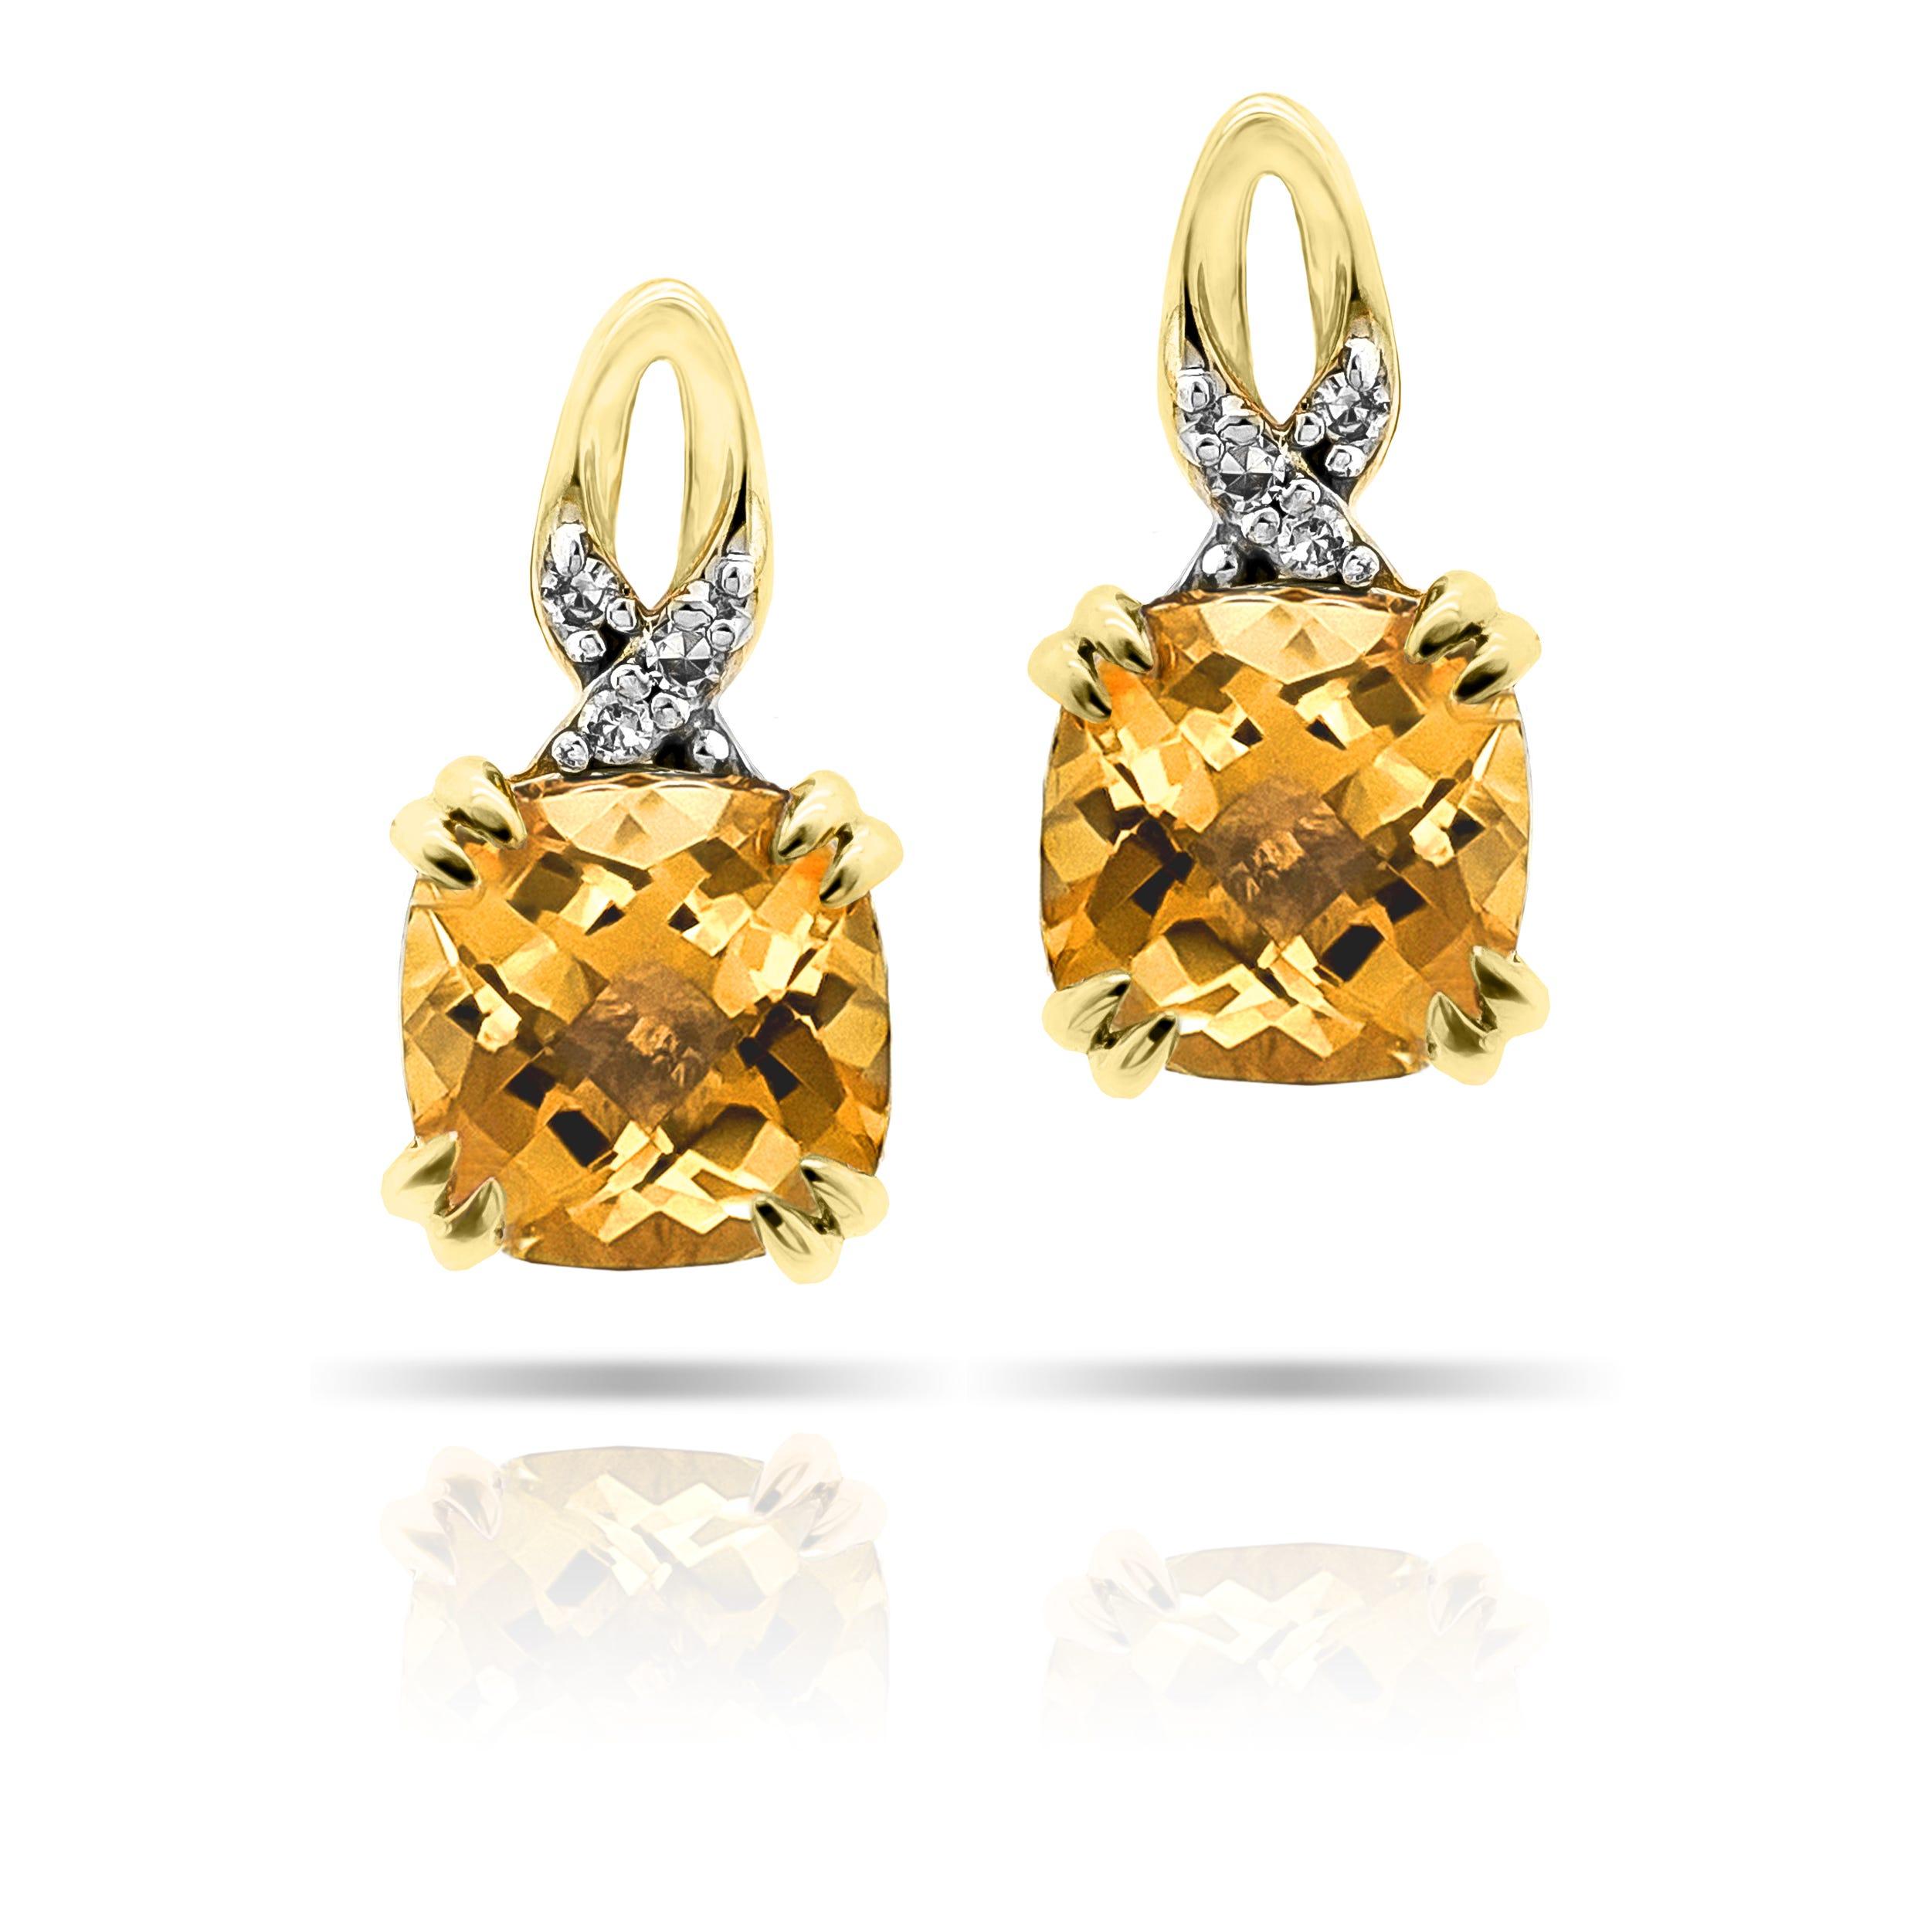 Cushion-Cut Citrine & Diamond Drop Earrings in 10k Yellow Gold